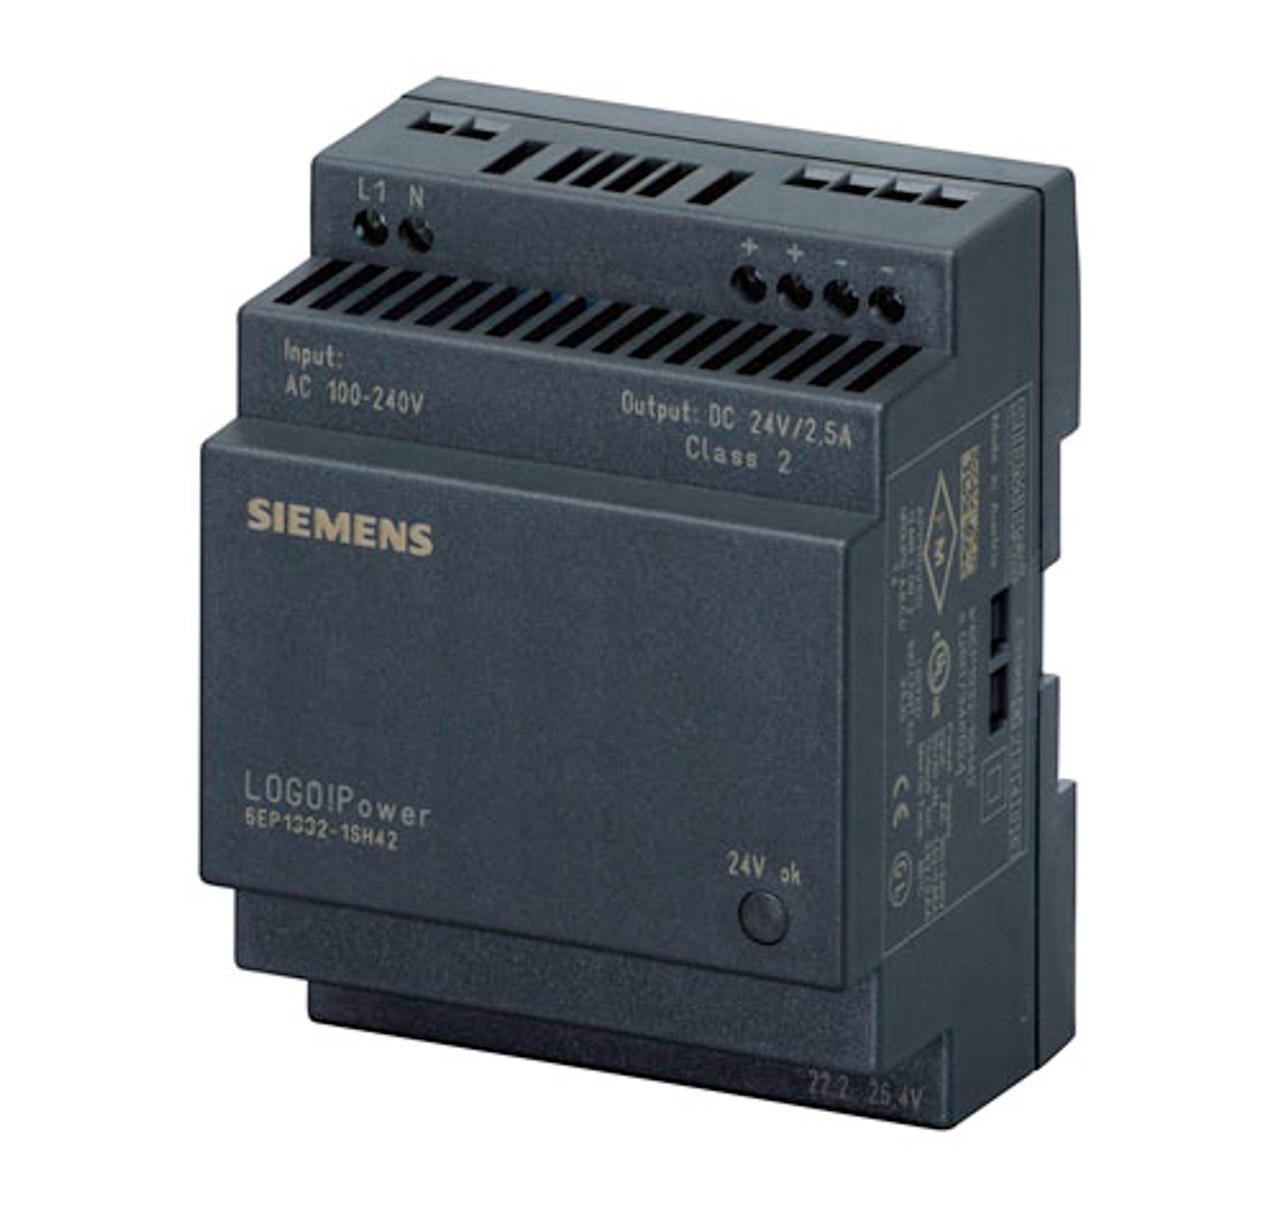 Siemens 6EP1322-1SH02 12V LOGO!Power I//O Power Module